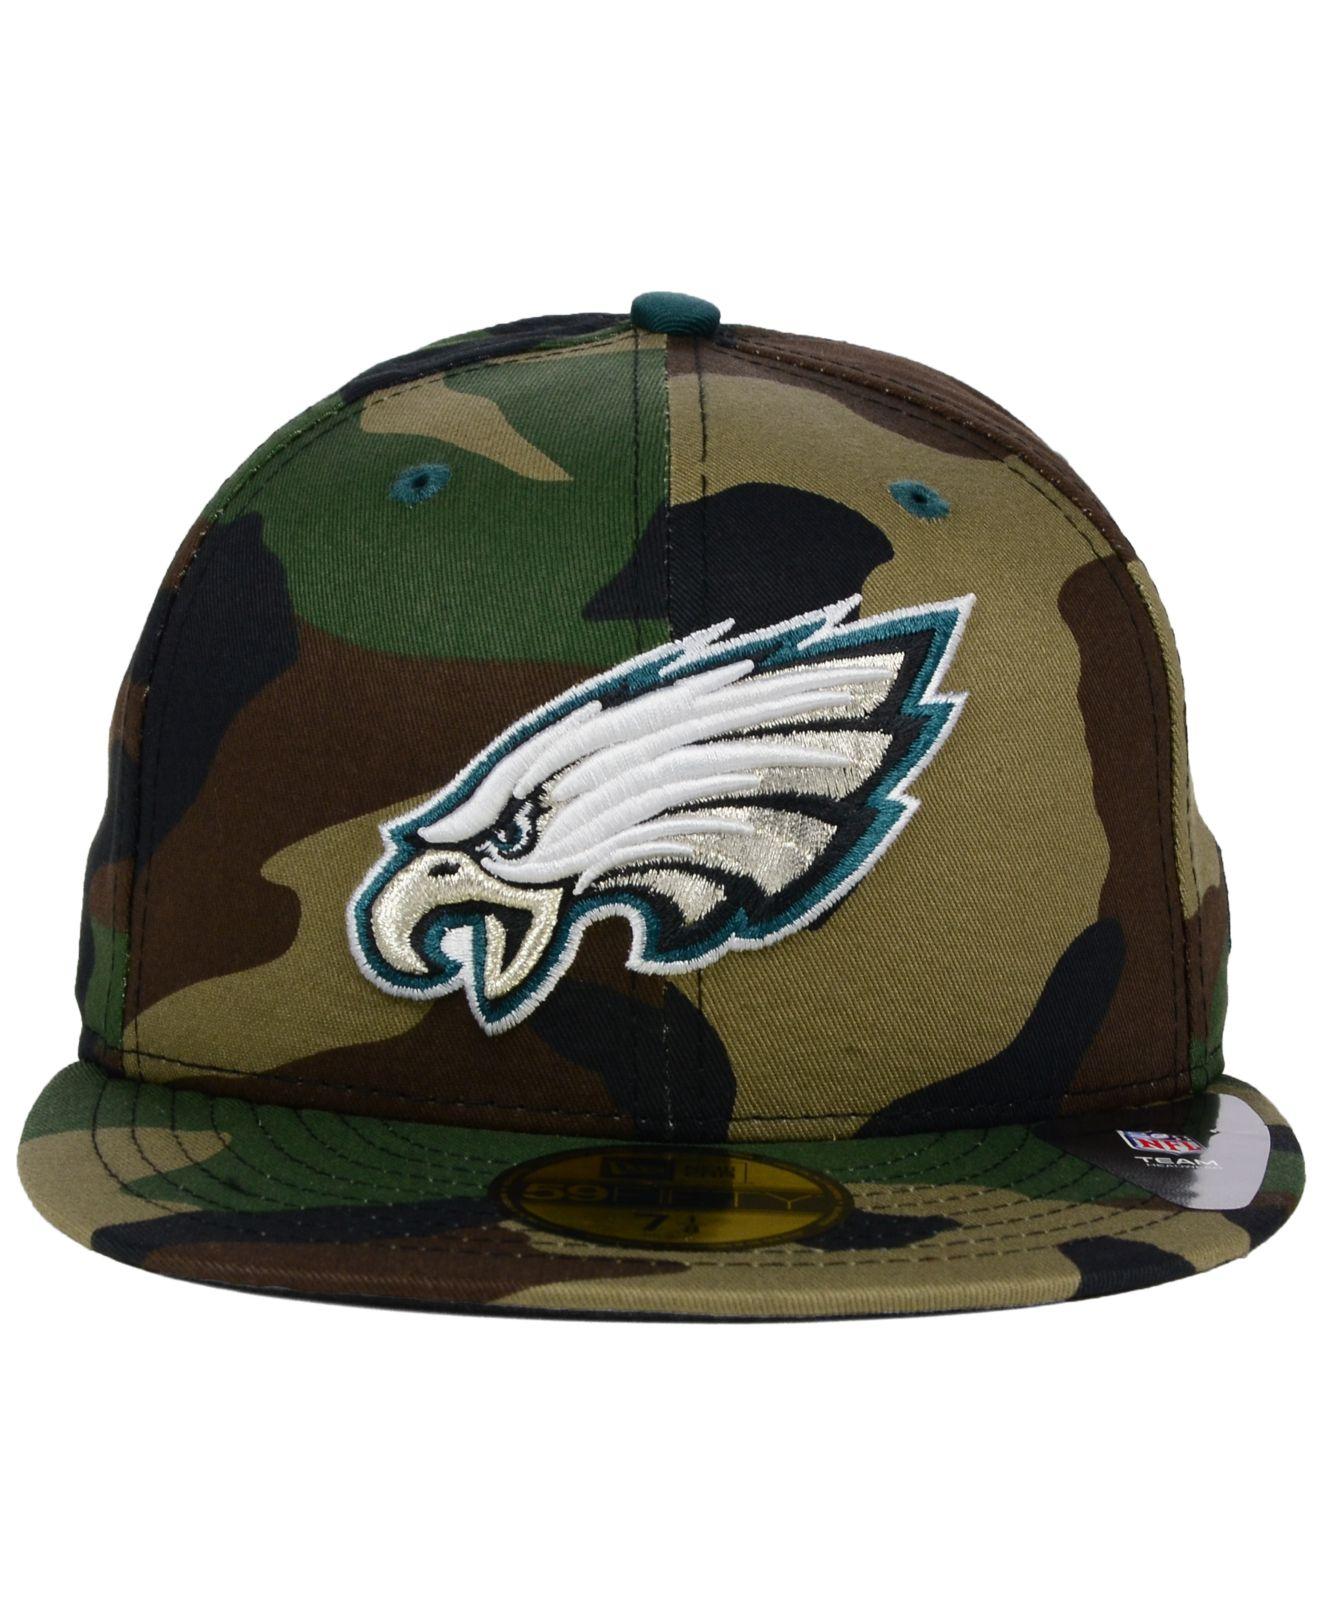 Lyst - KTZ Philadelphia Eagles Camo Pop 59fifty Cap in Green for Men 20c68063d